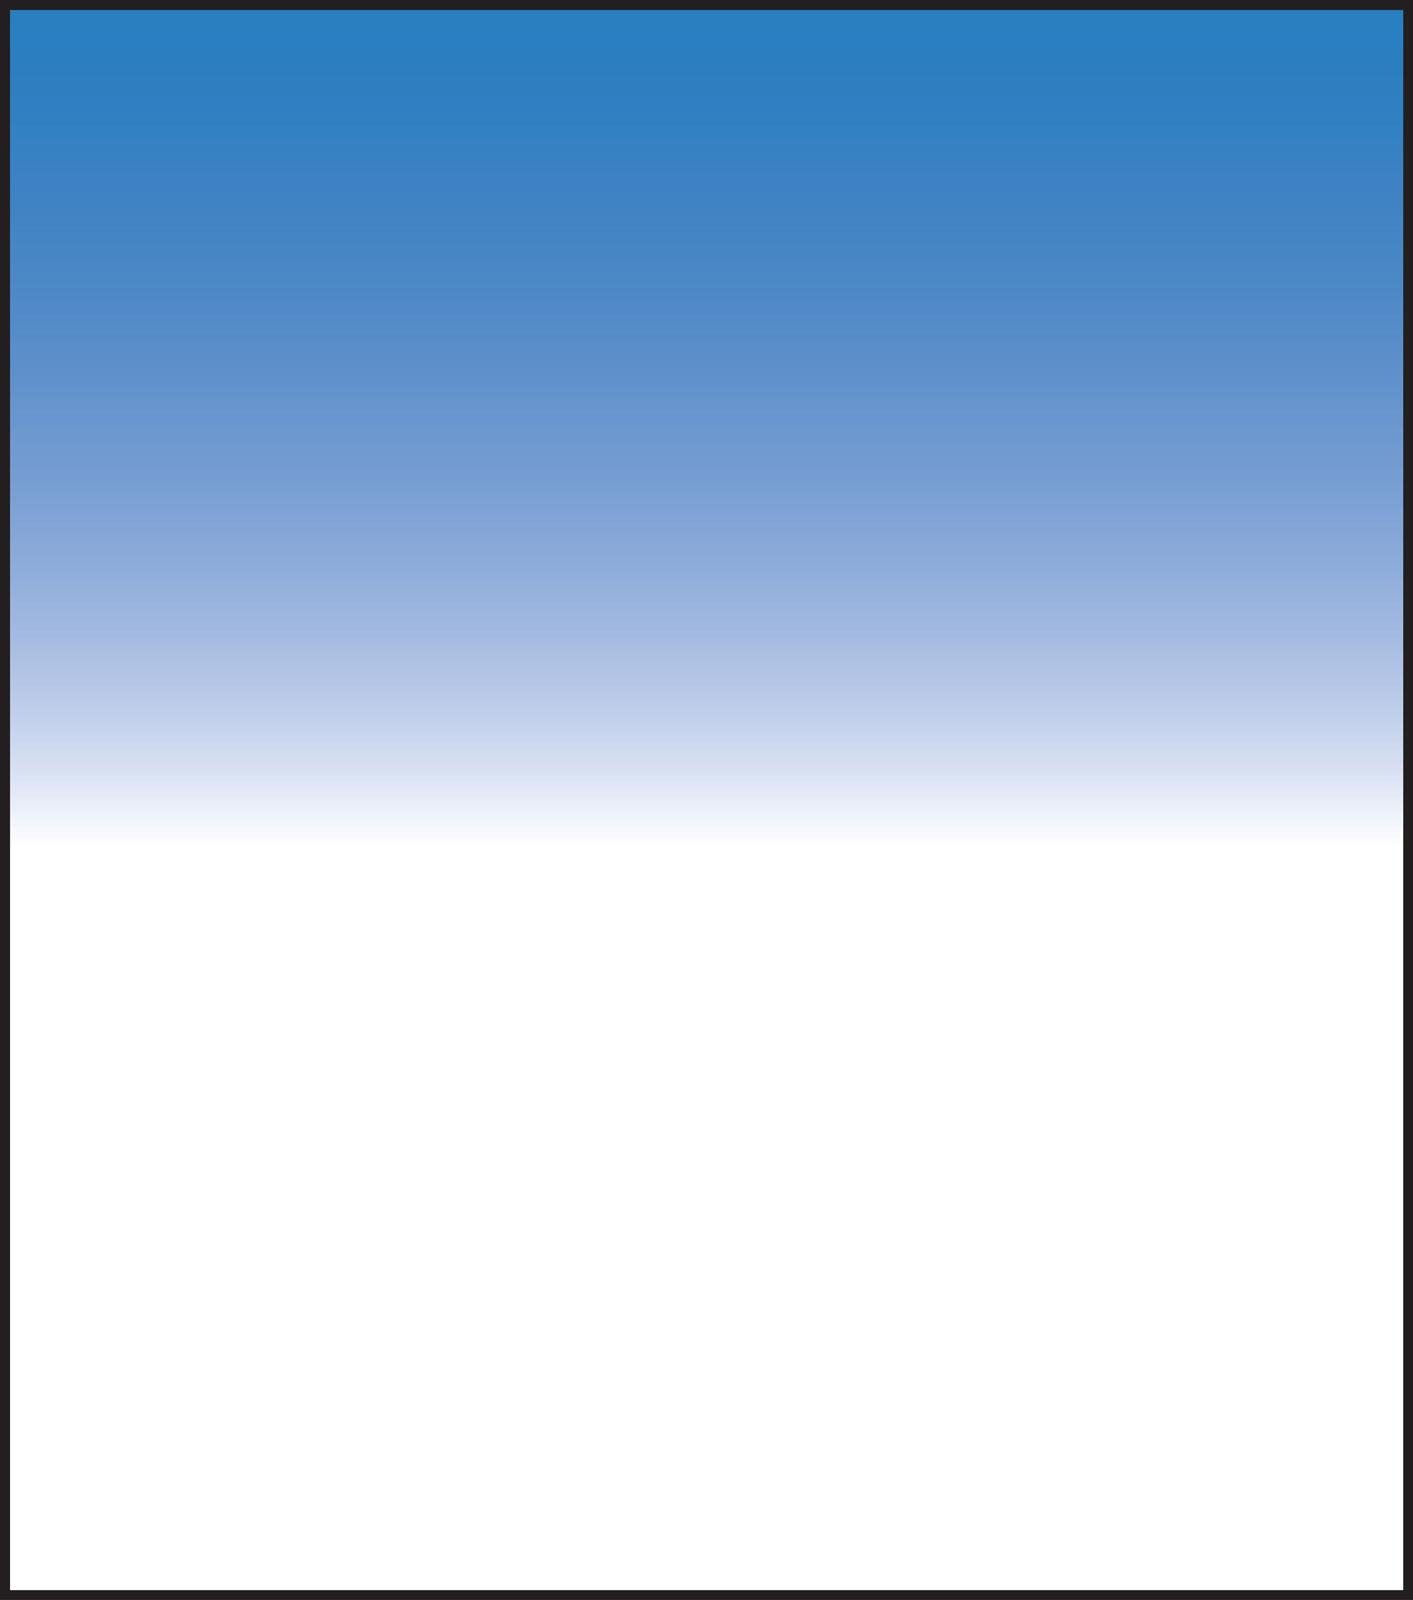 SW150-Sky-Blue-4-Hard-Grad